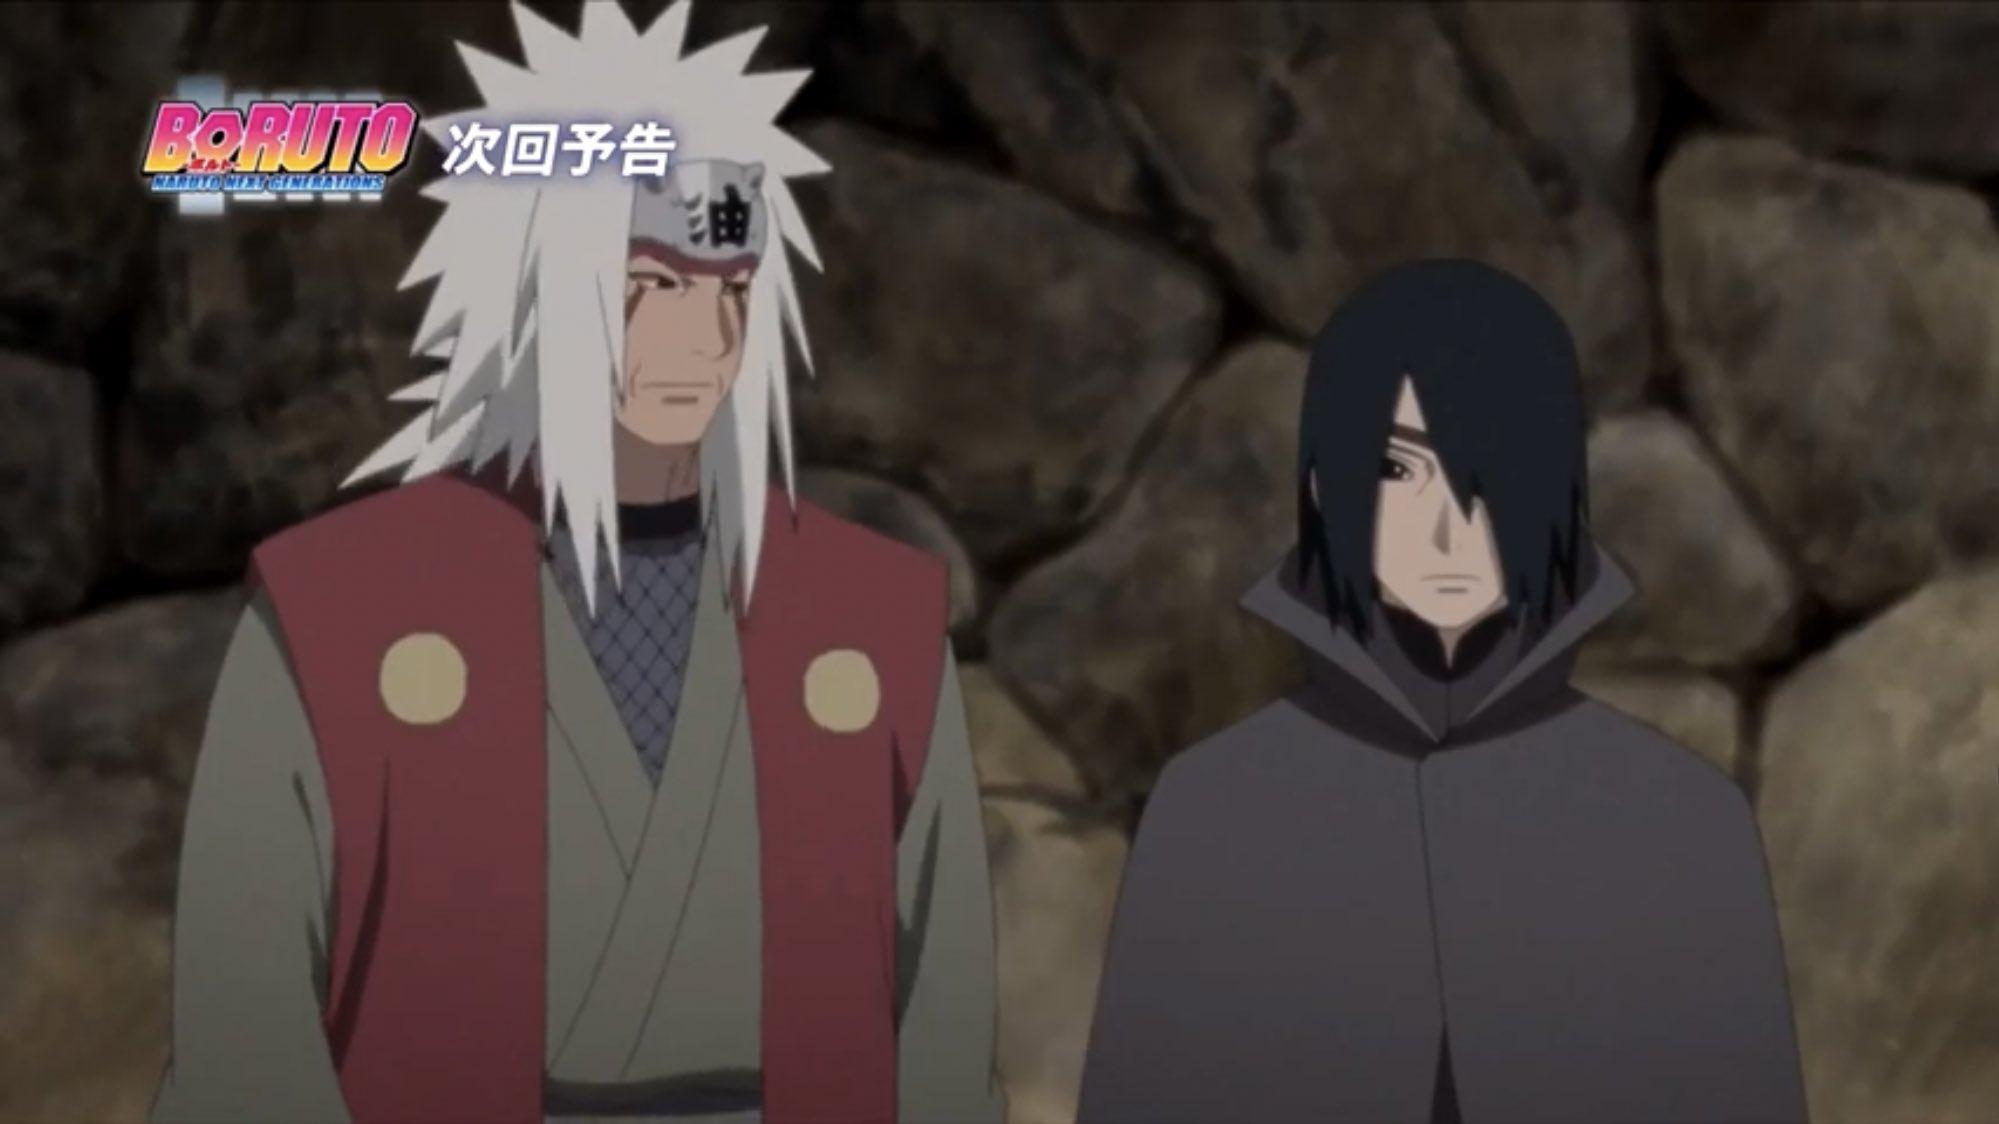 Boruto S Time Travel Arc Sees Jiraiya Fight Alongside Sasuke